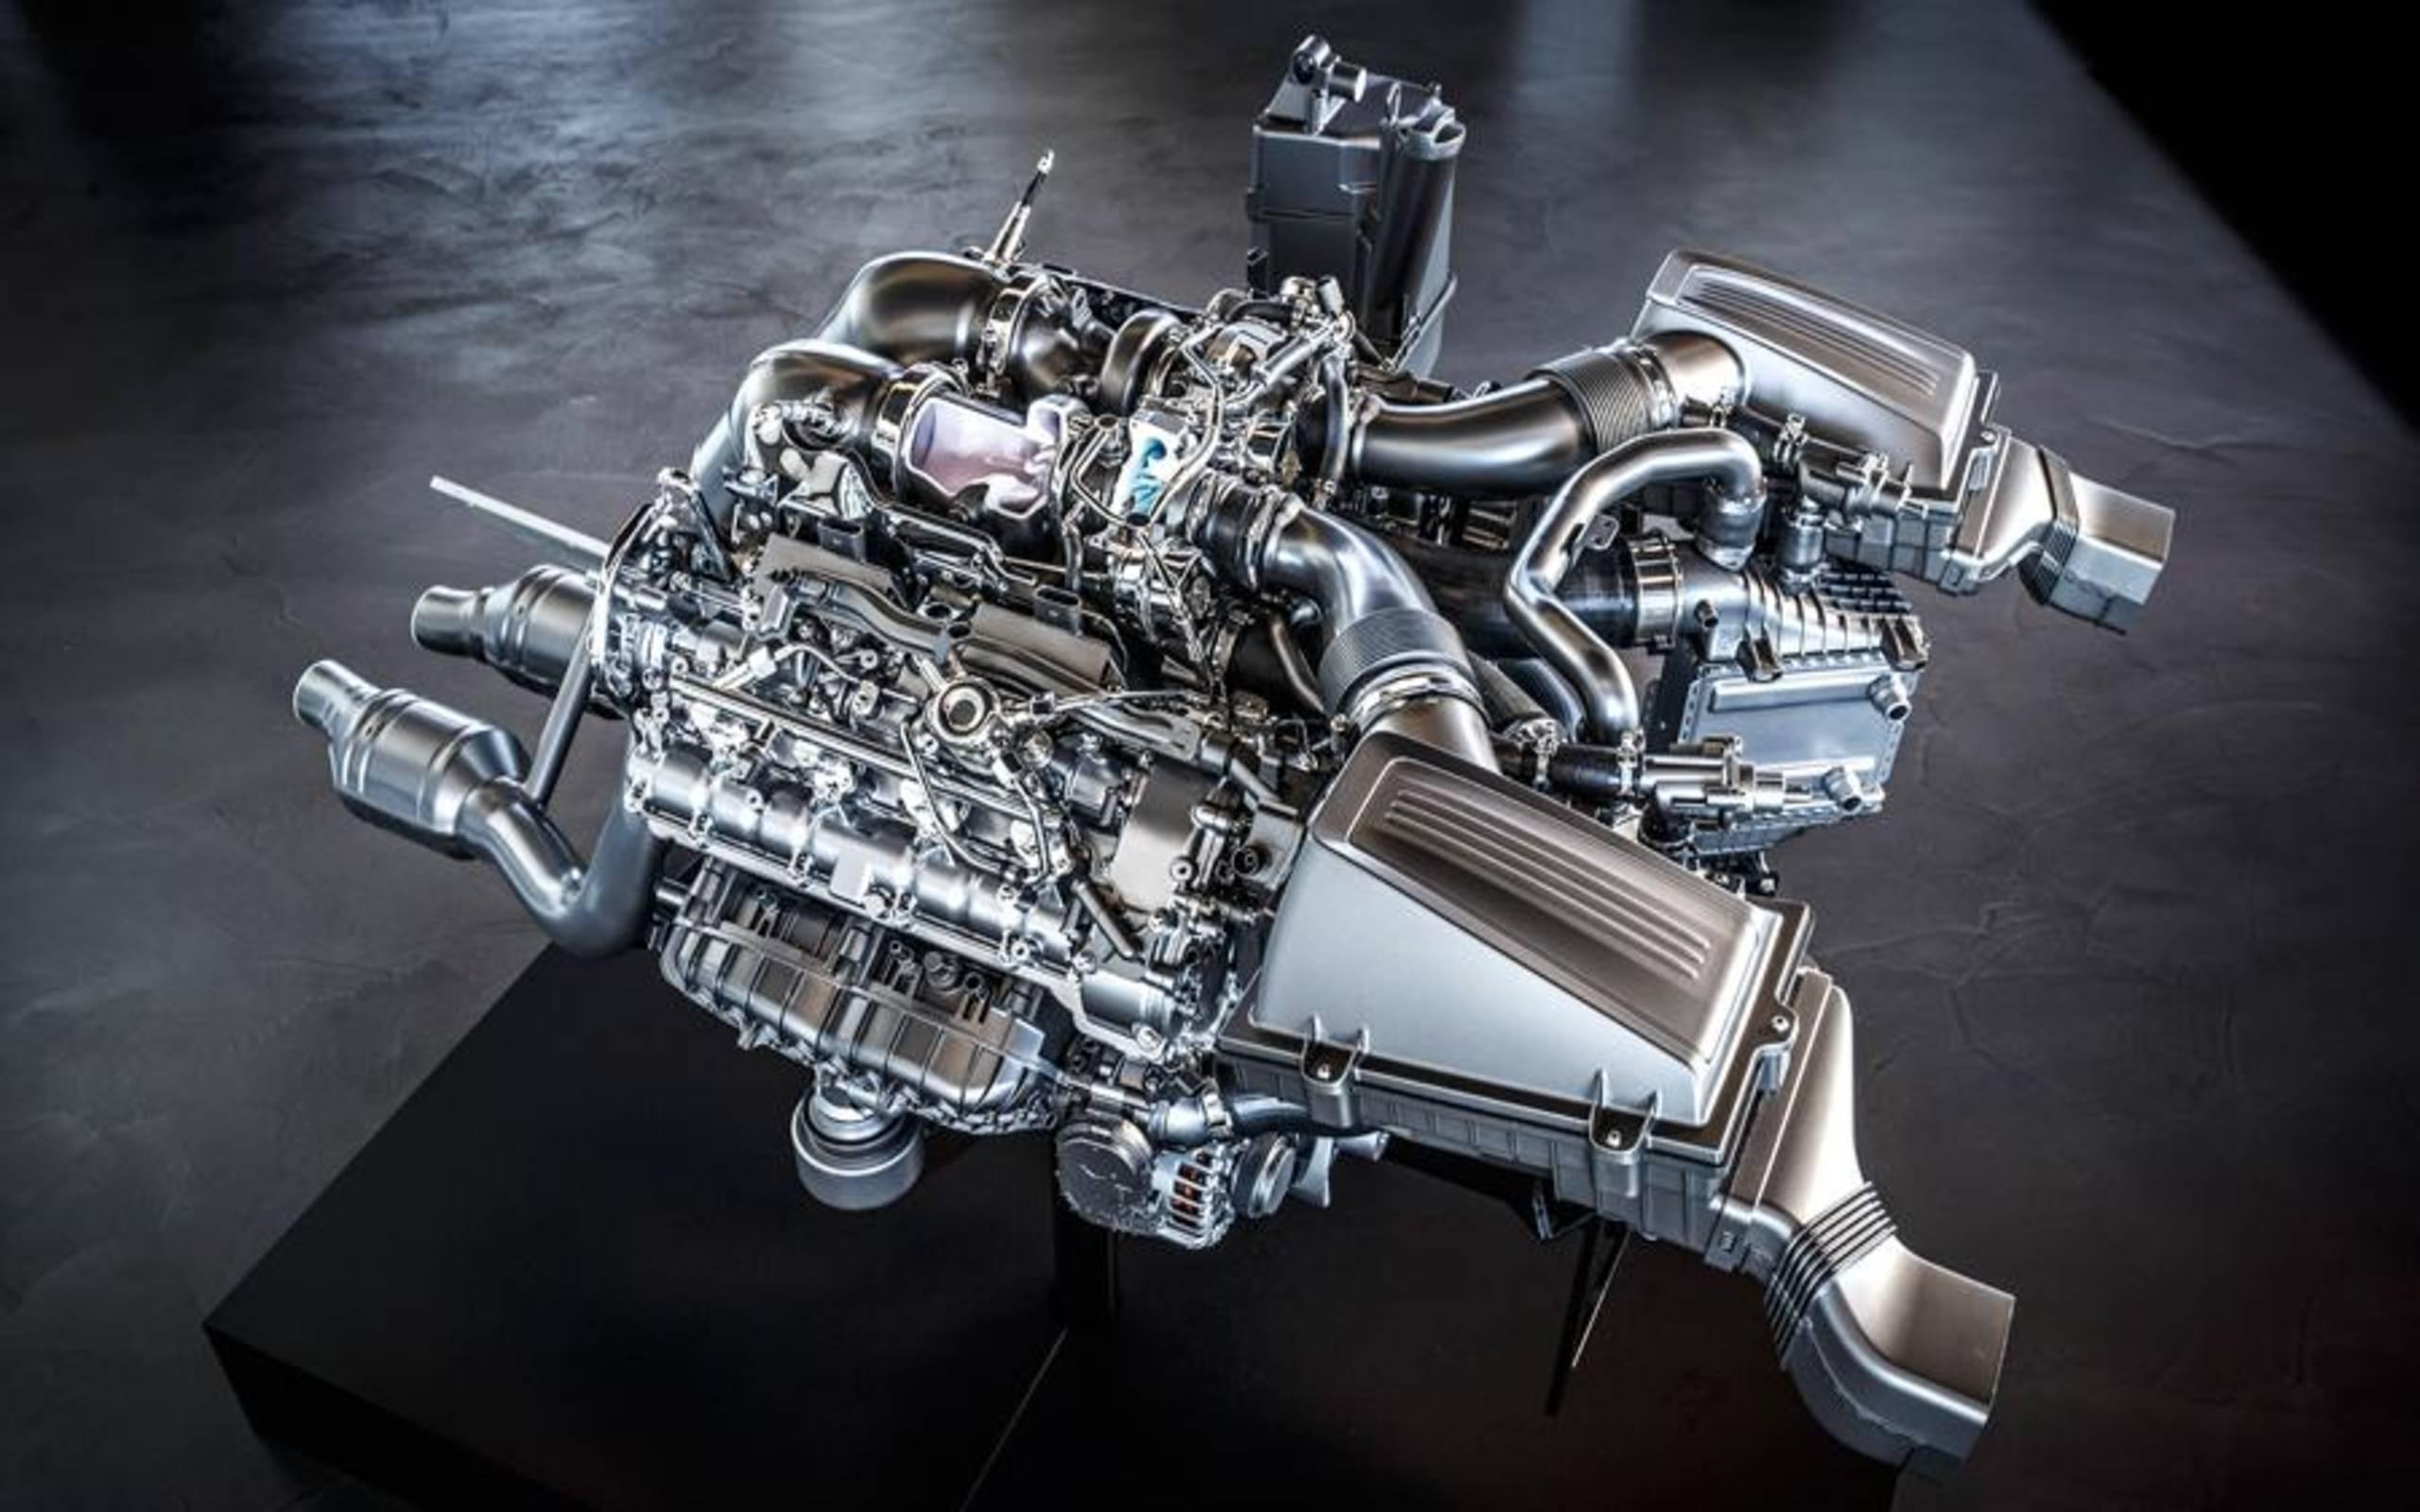 Mercedes-AMG M178